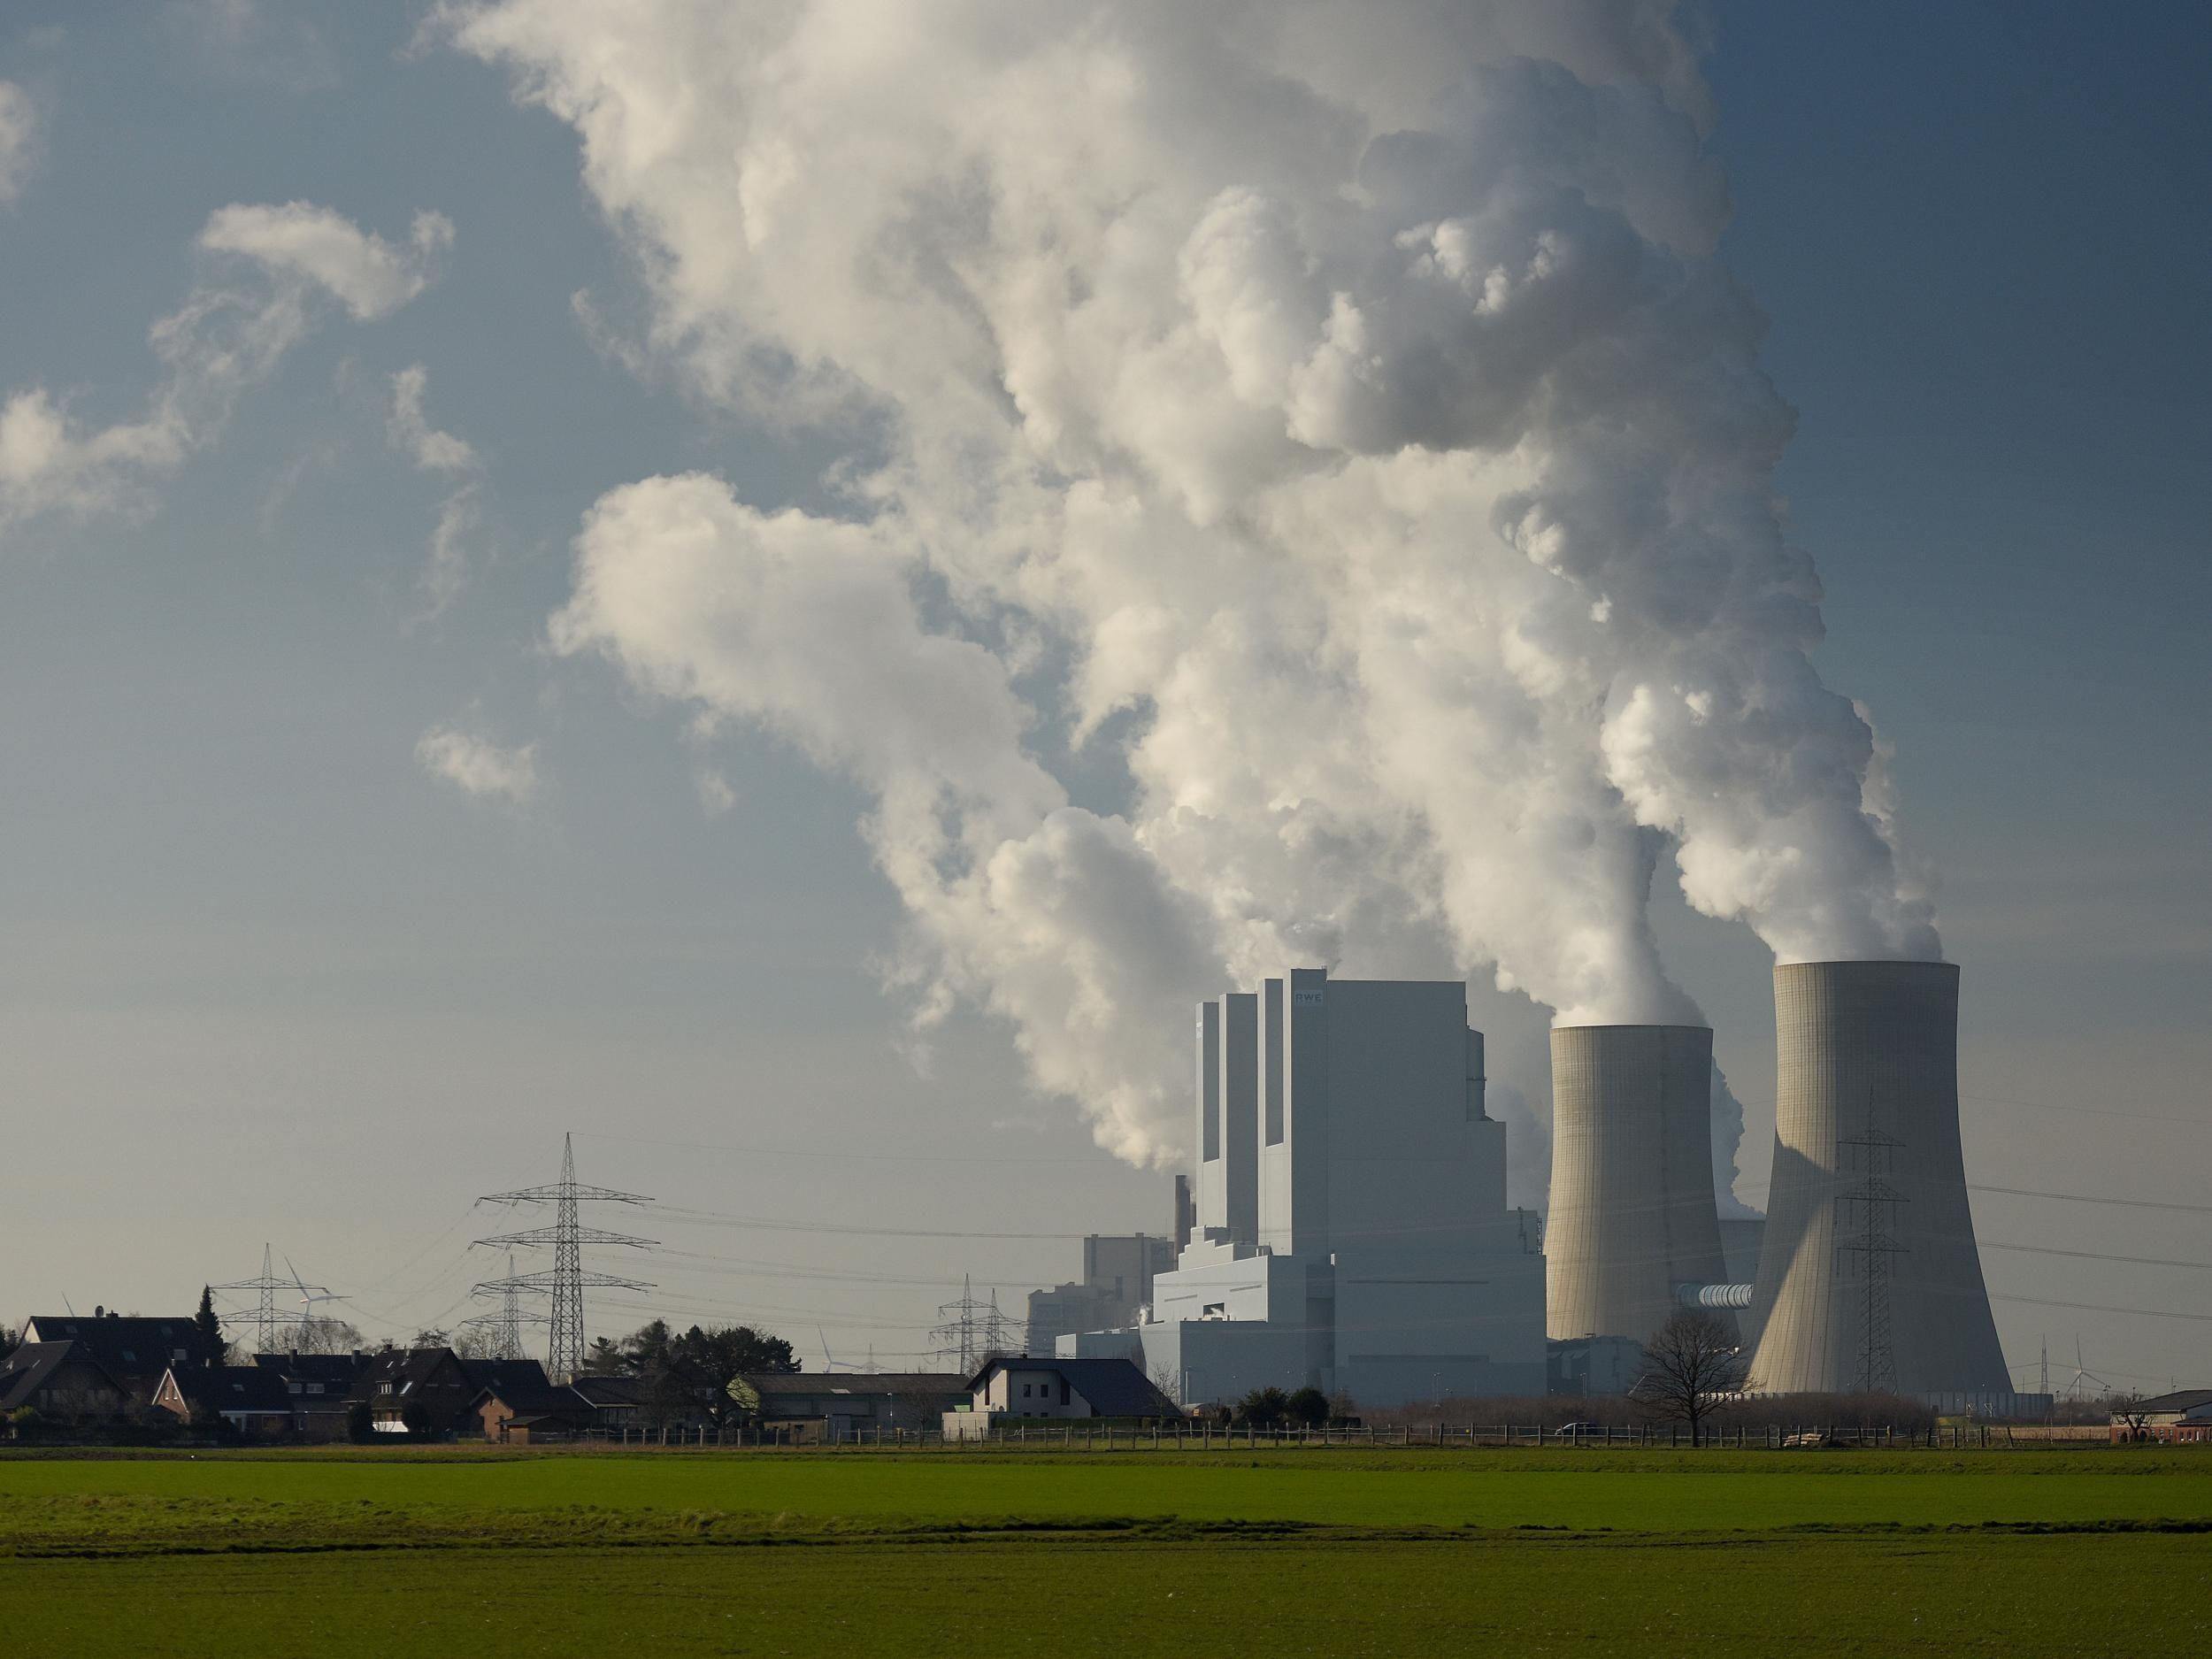 World abandons coal in dramatic style raising hope of